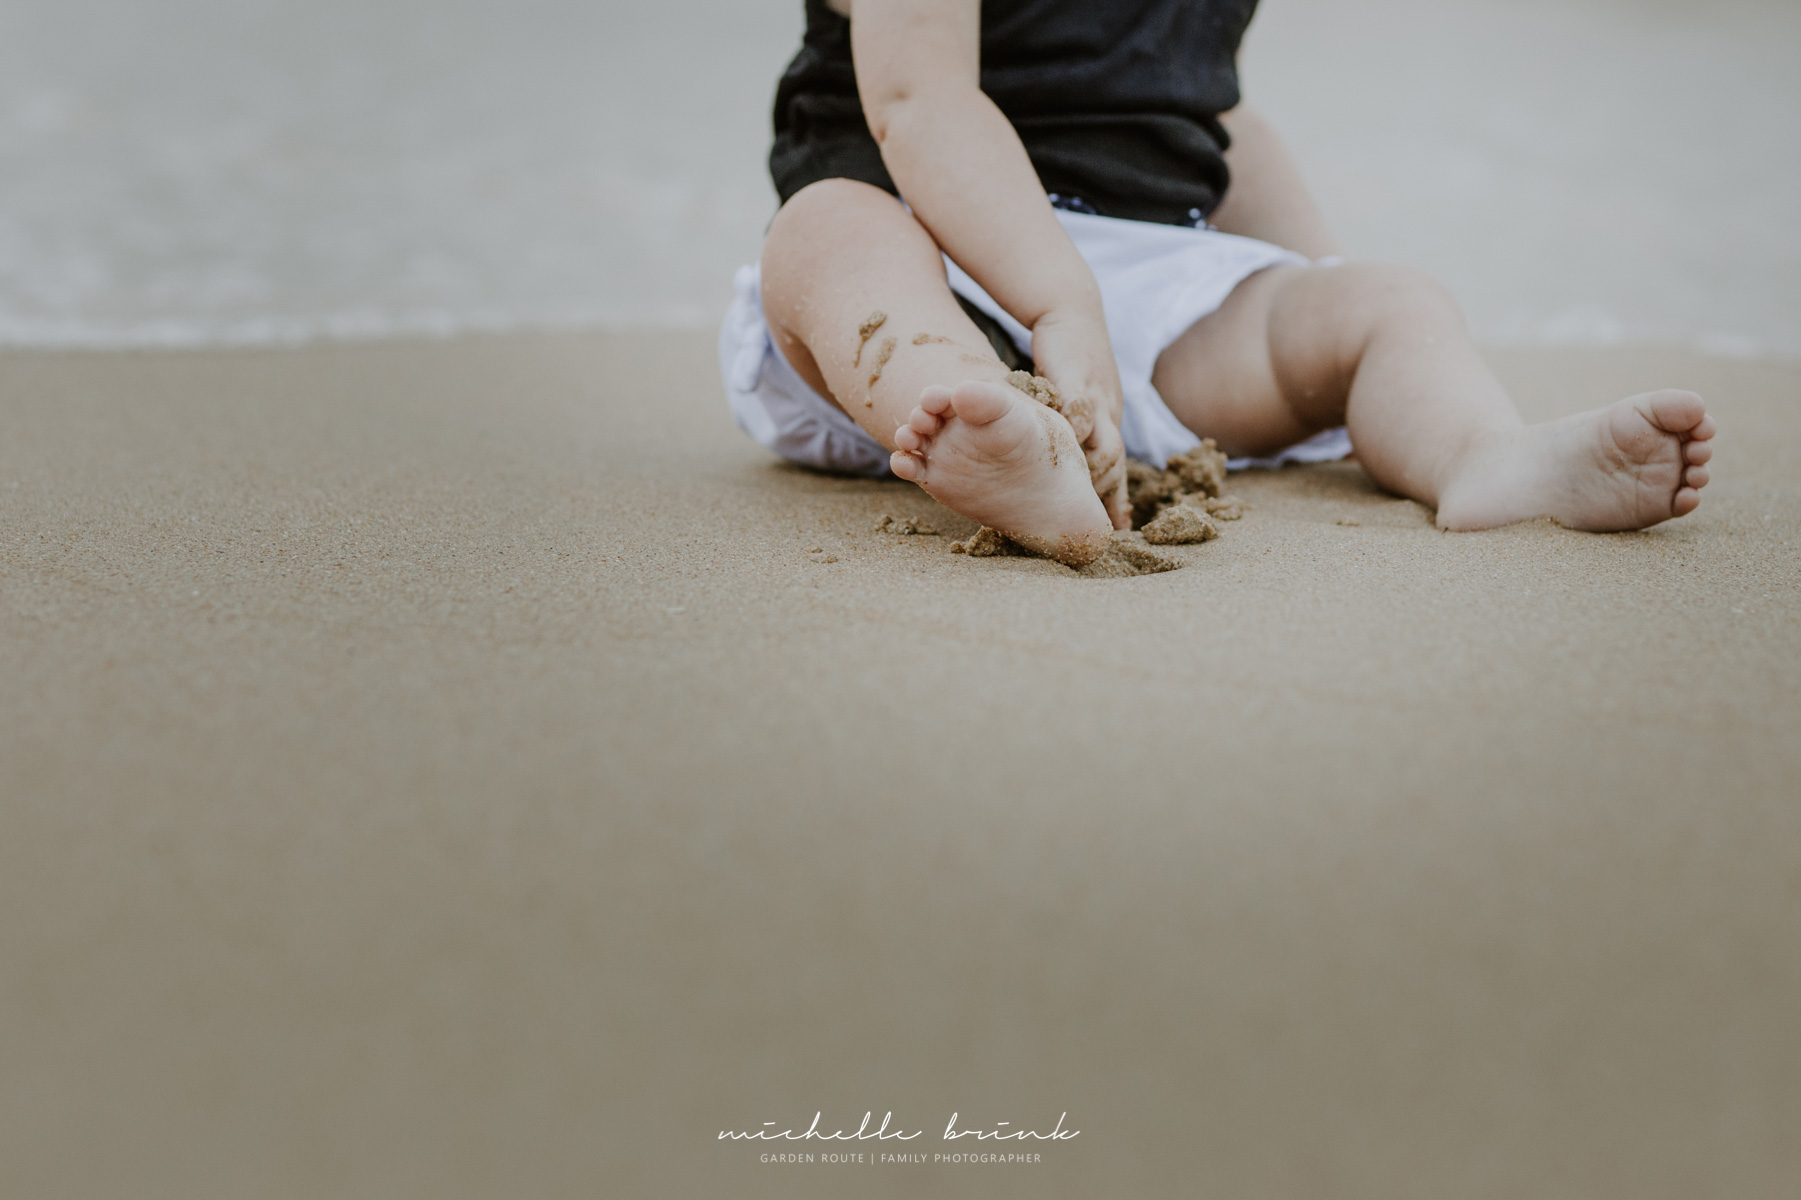 michelle brink, garden route, family photography, knysna, plettenberg bay, forest, beach, plett it's a feeling, family photograph, robberg 5, van der walt family, photographer